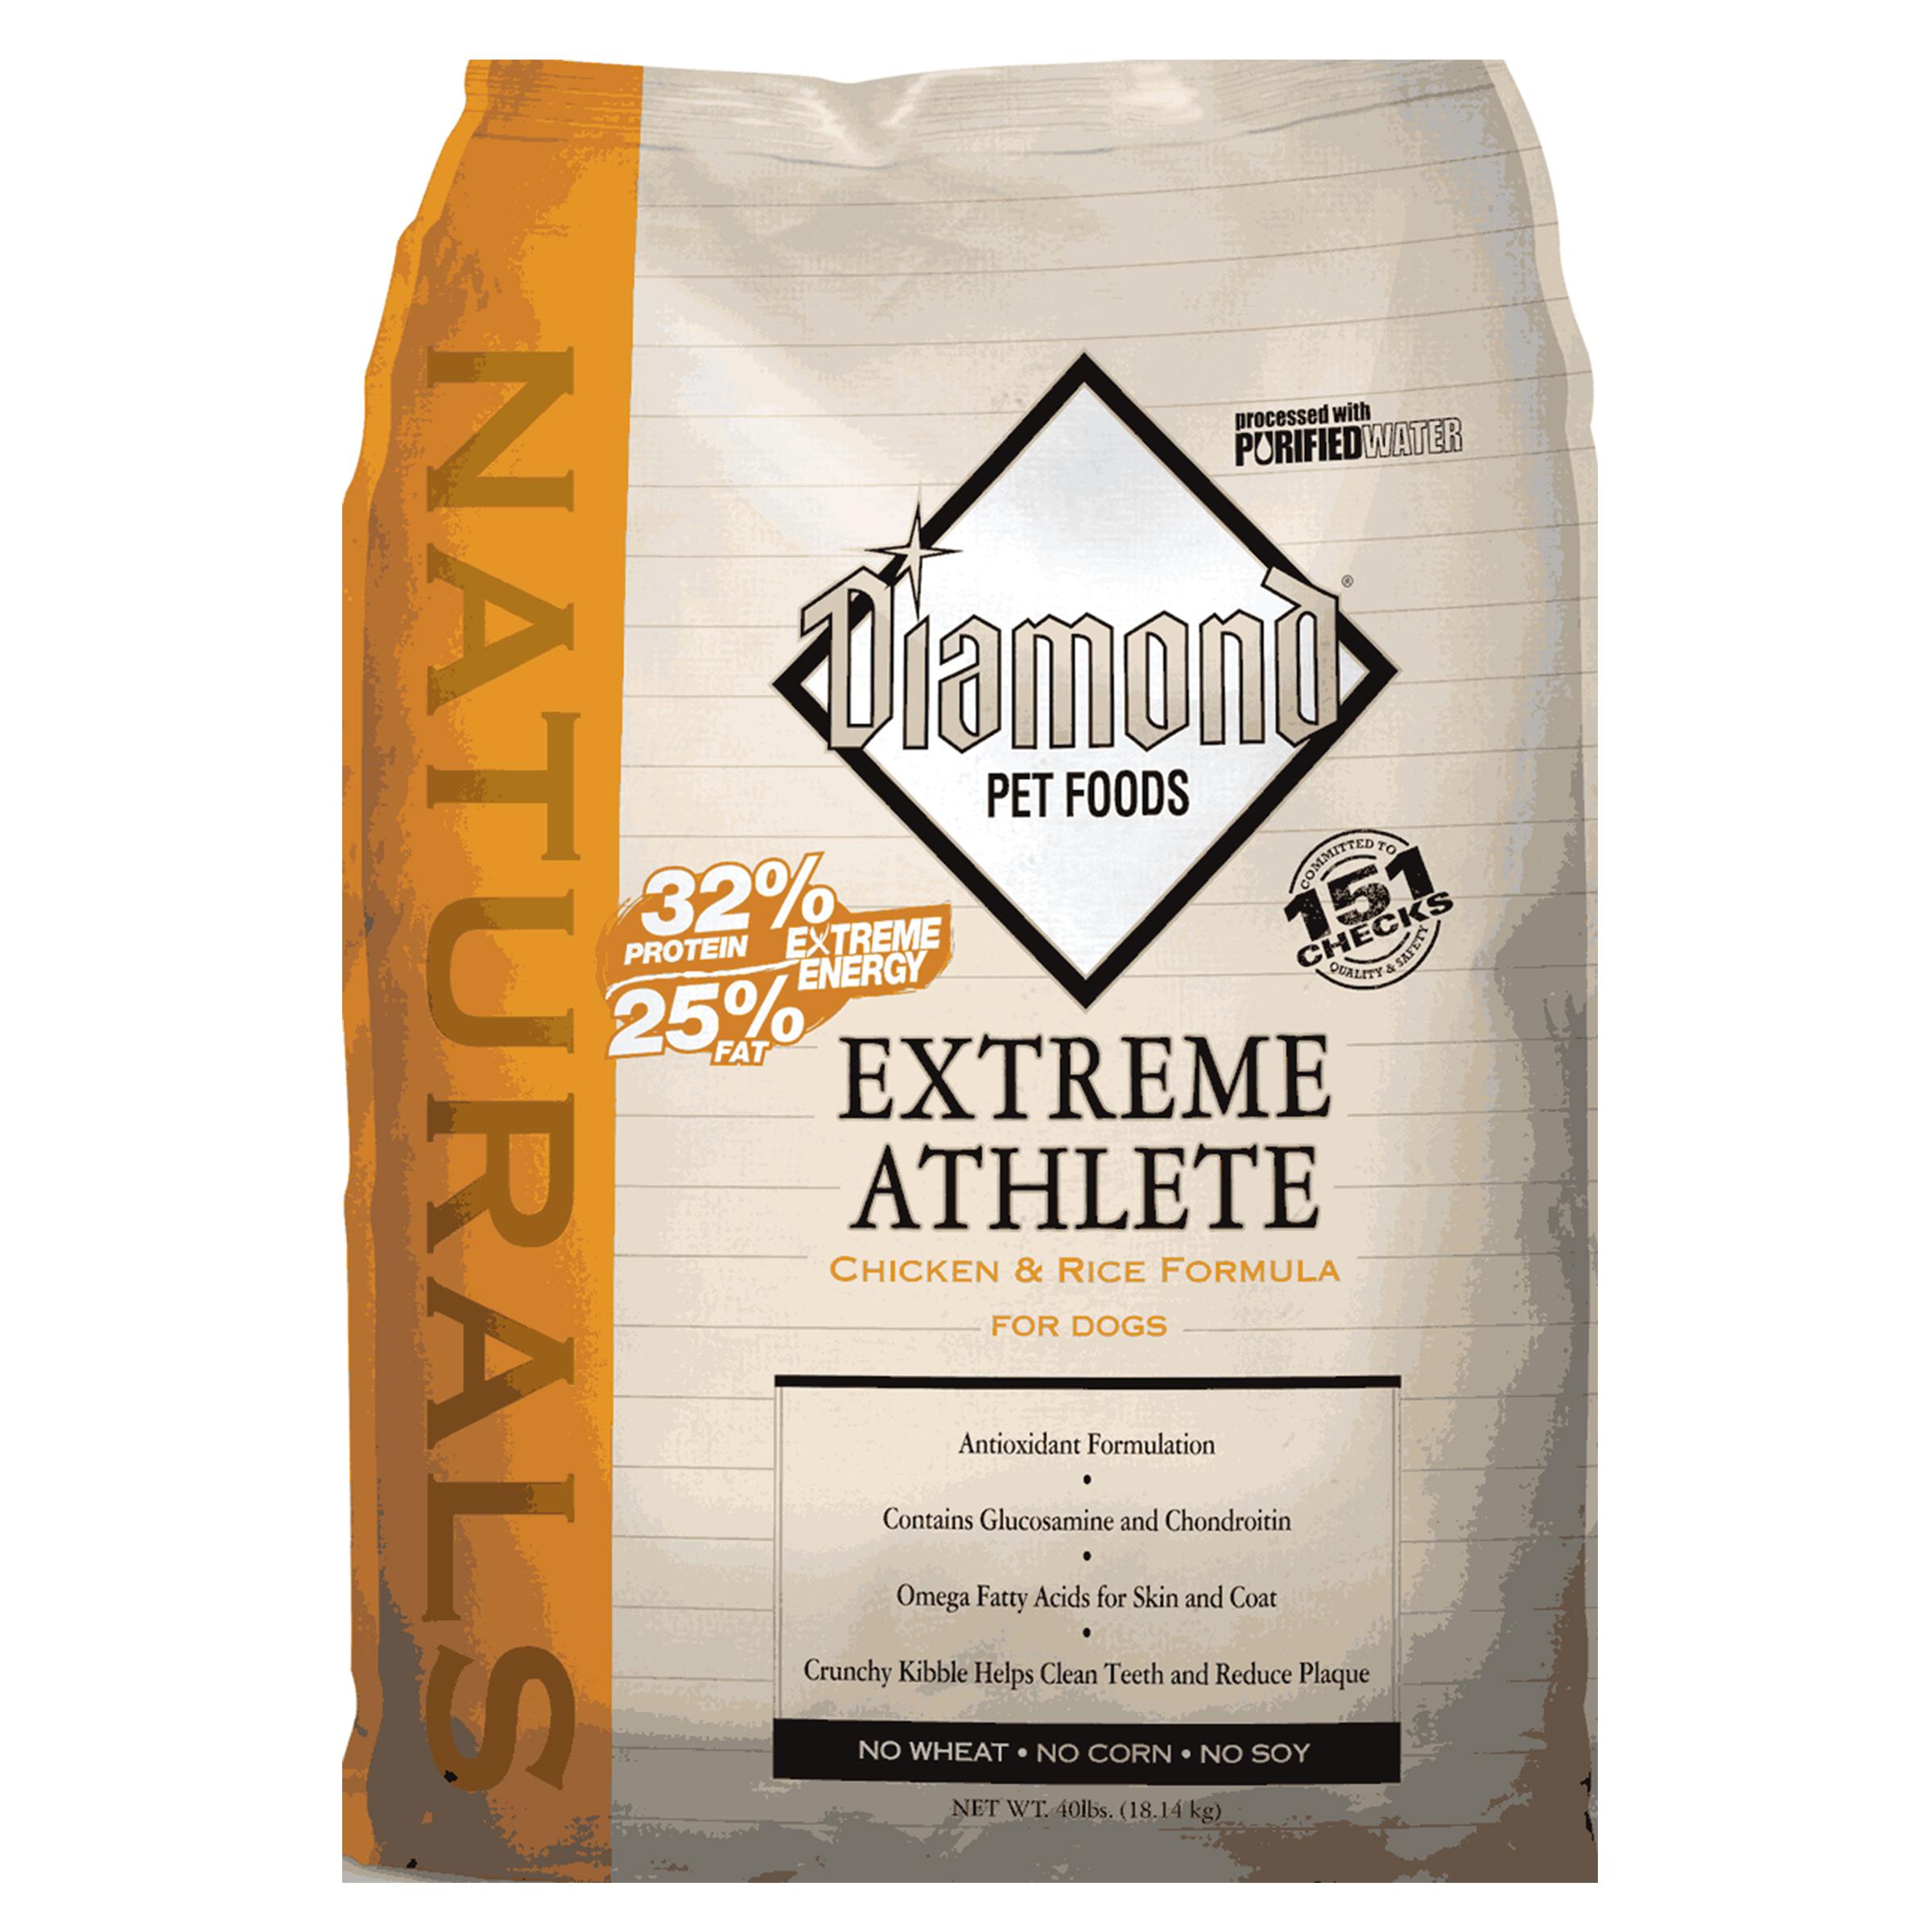 Puppy Diamond Dog Food >> Diamond Naturals Extreme Athlete 40 lb. Dry Dog Food #999401